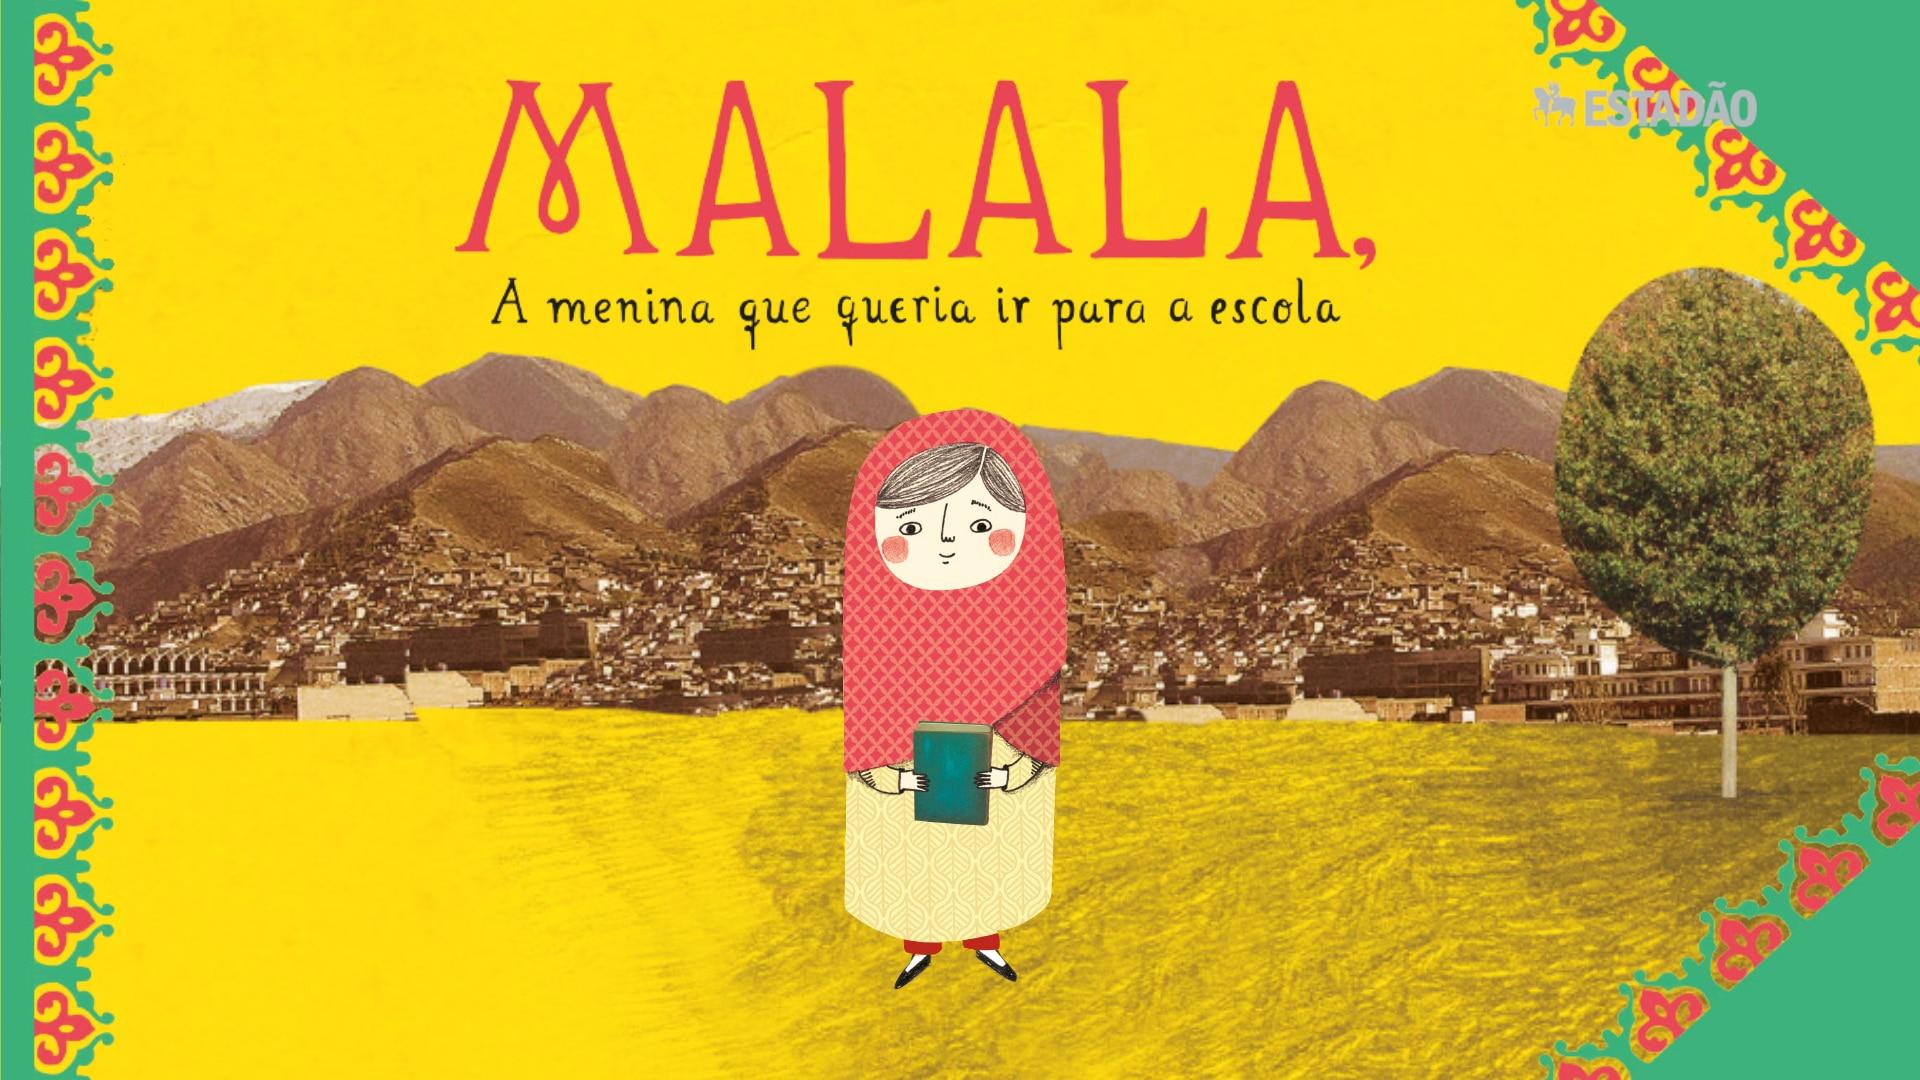 História de Malala vira livro infantil